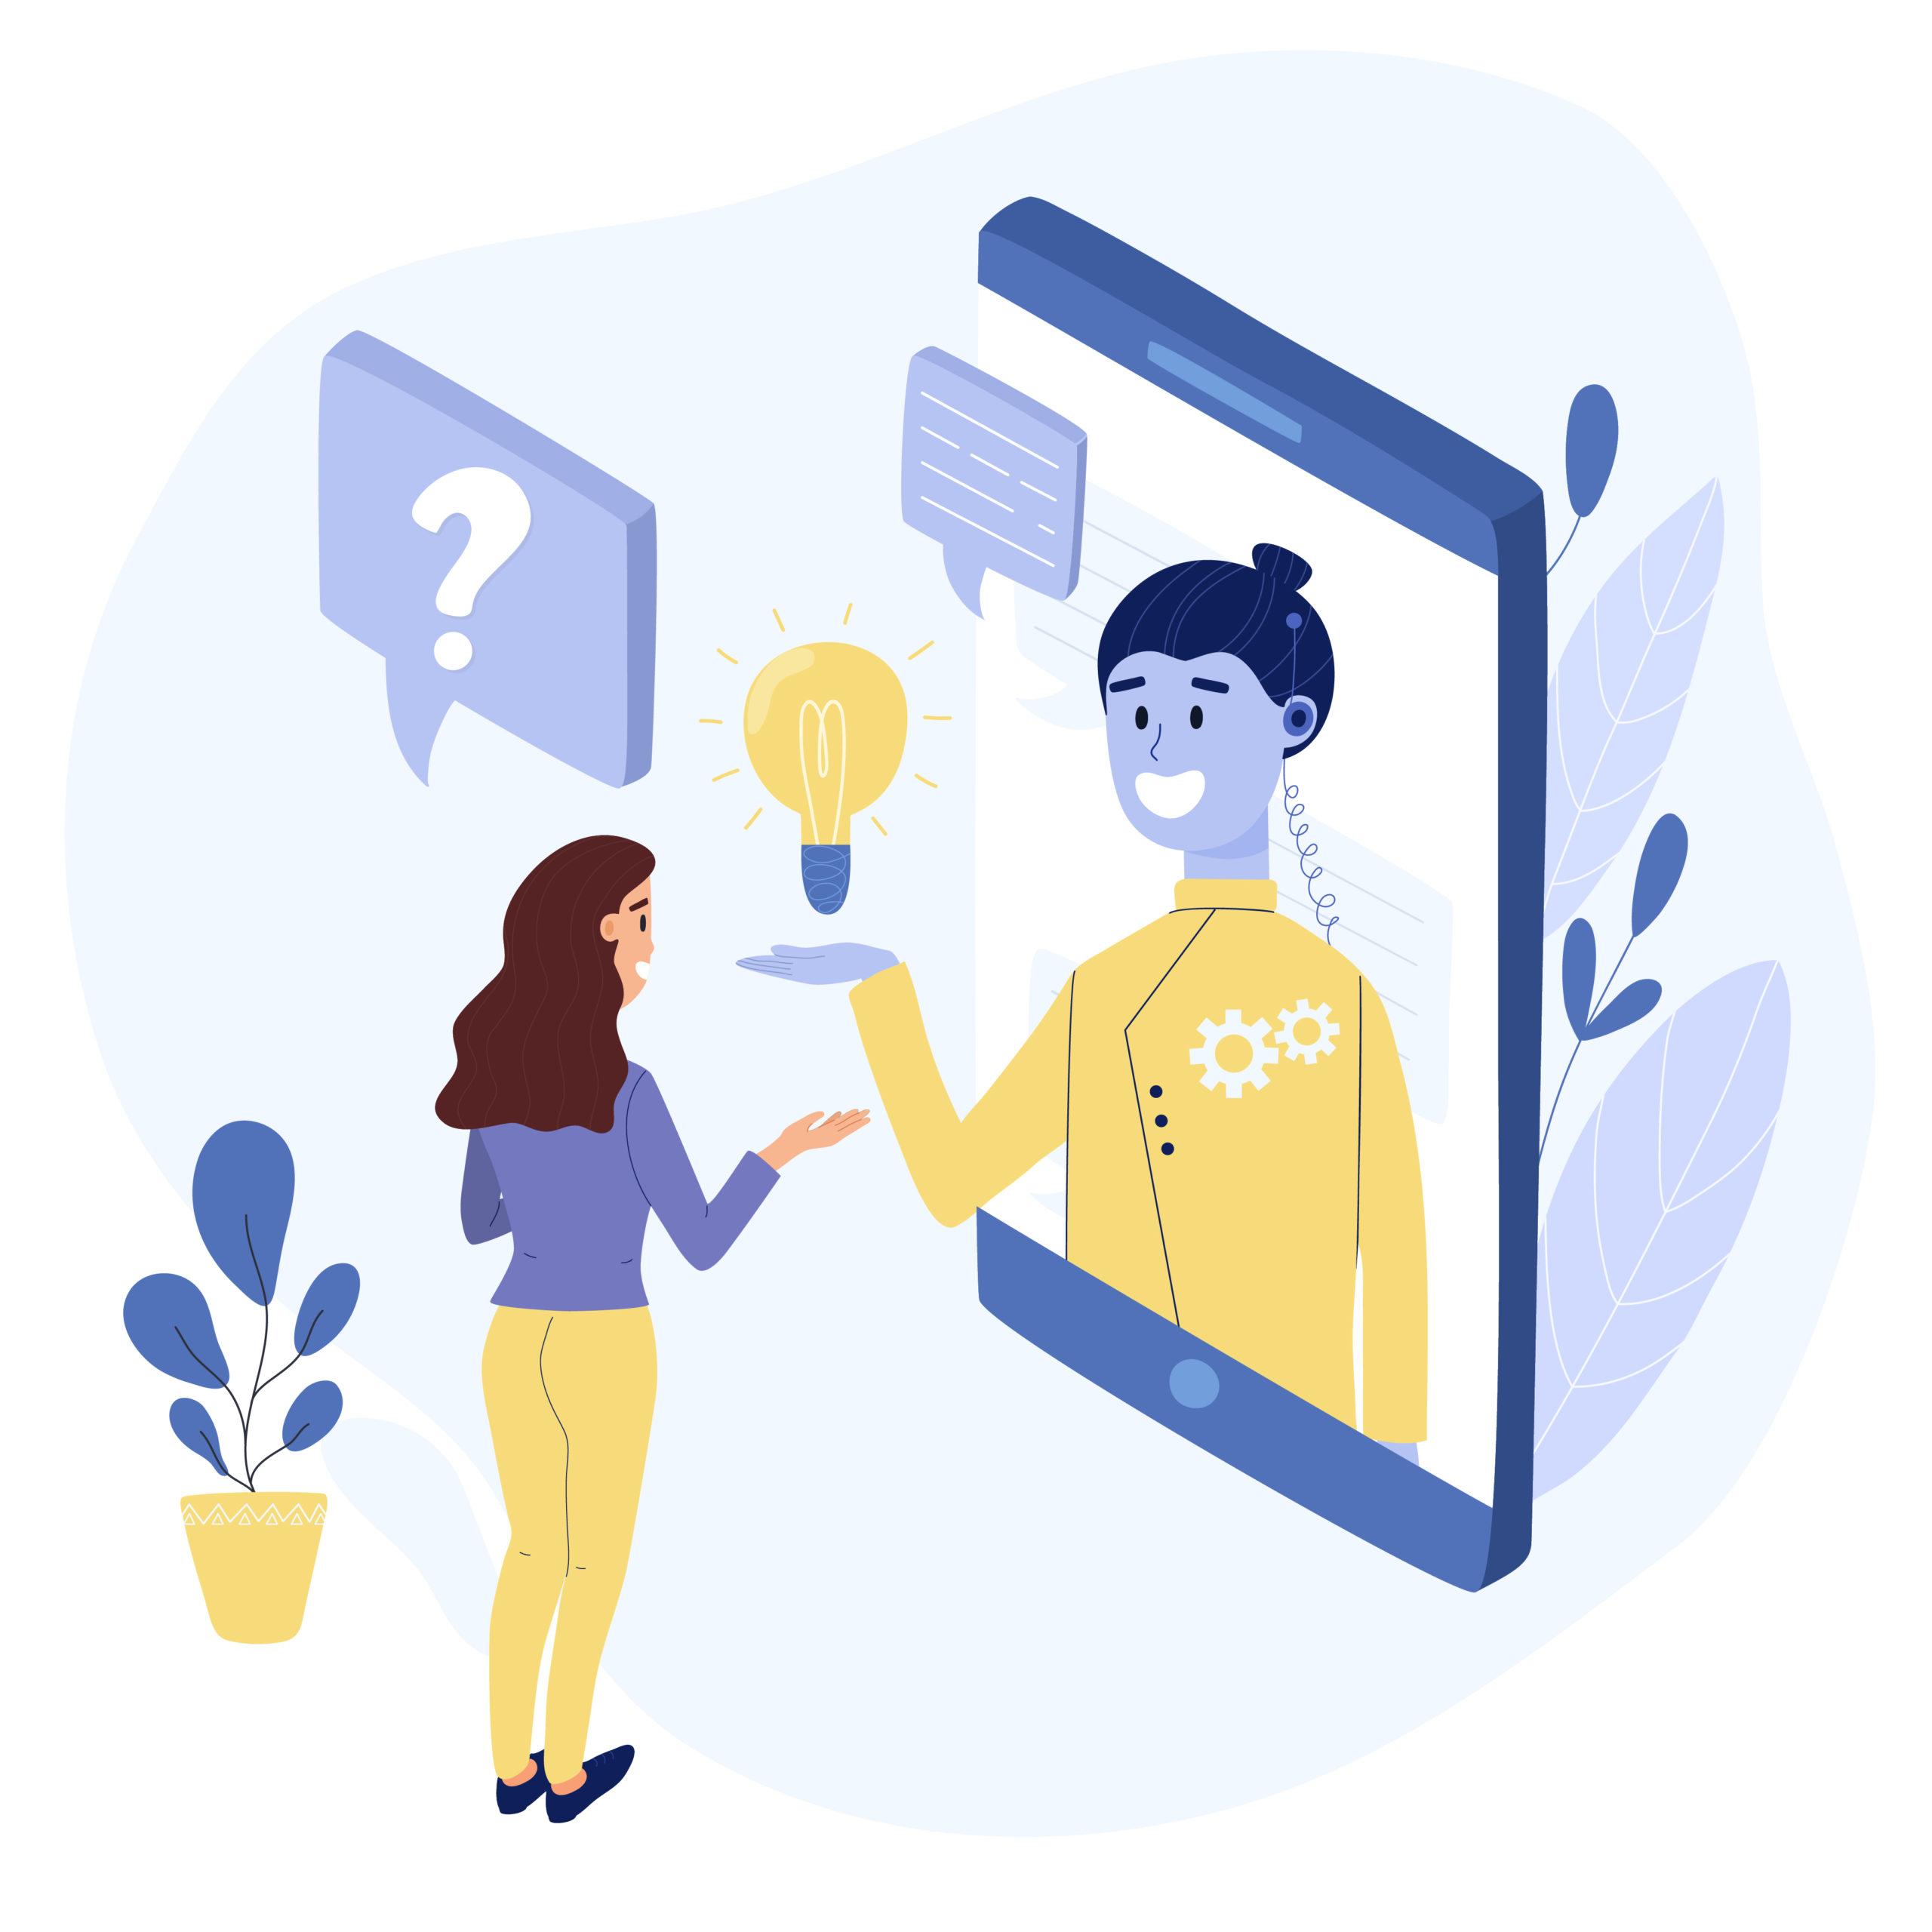 Humanizar un asistente virtual